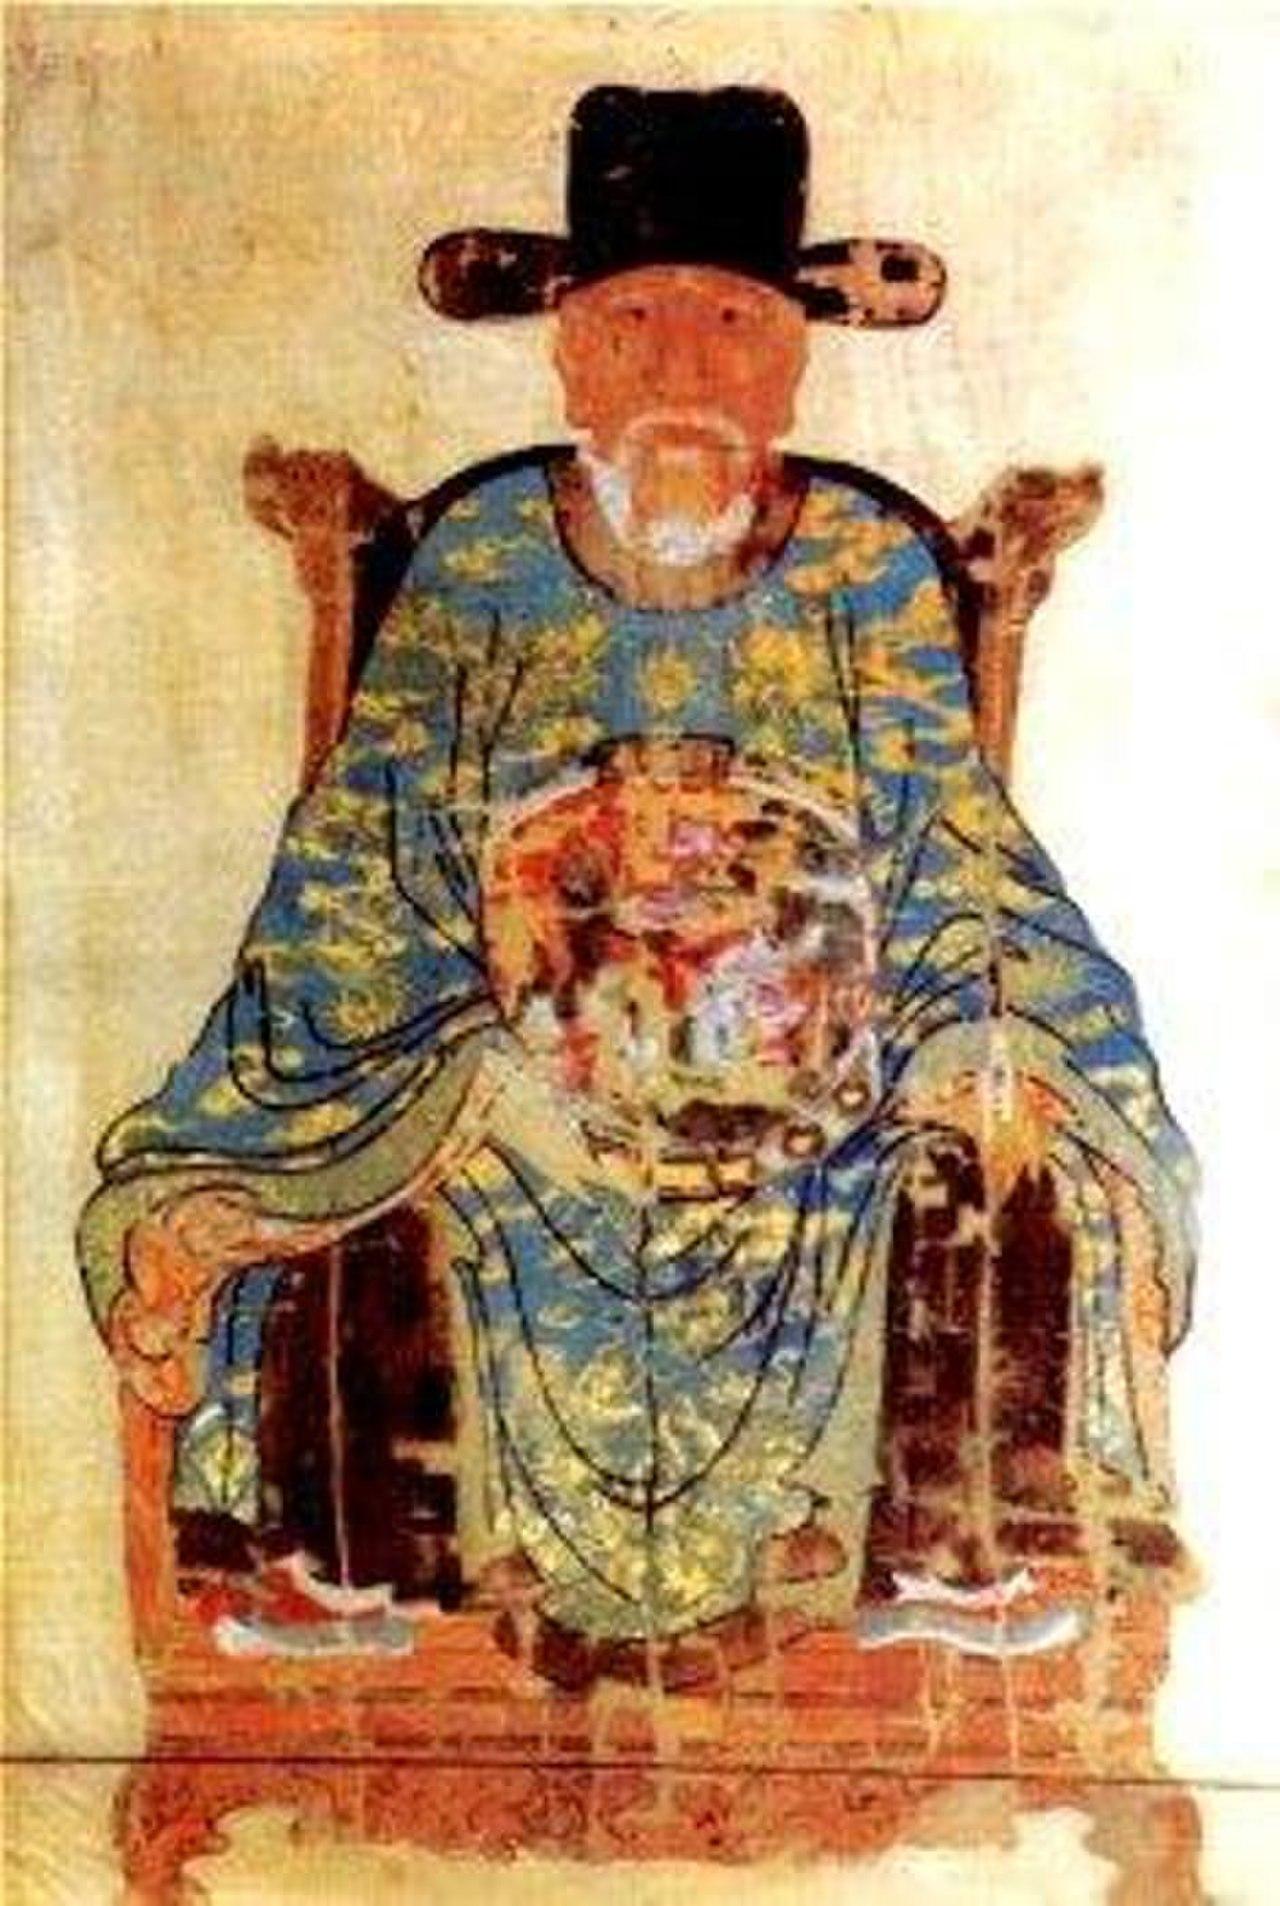 http://upload.wikimedia.org/wikipedia/commons/c/c6/Nguyen_Trai.jpg